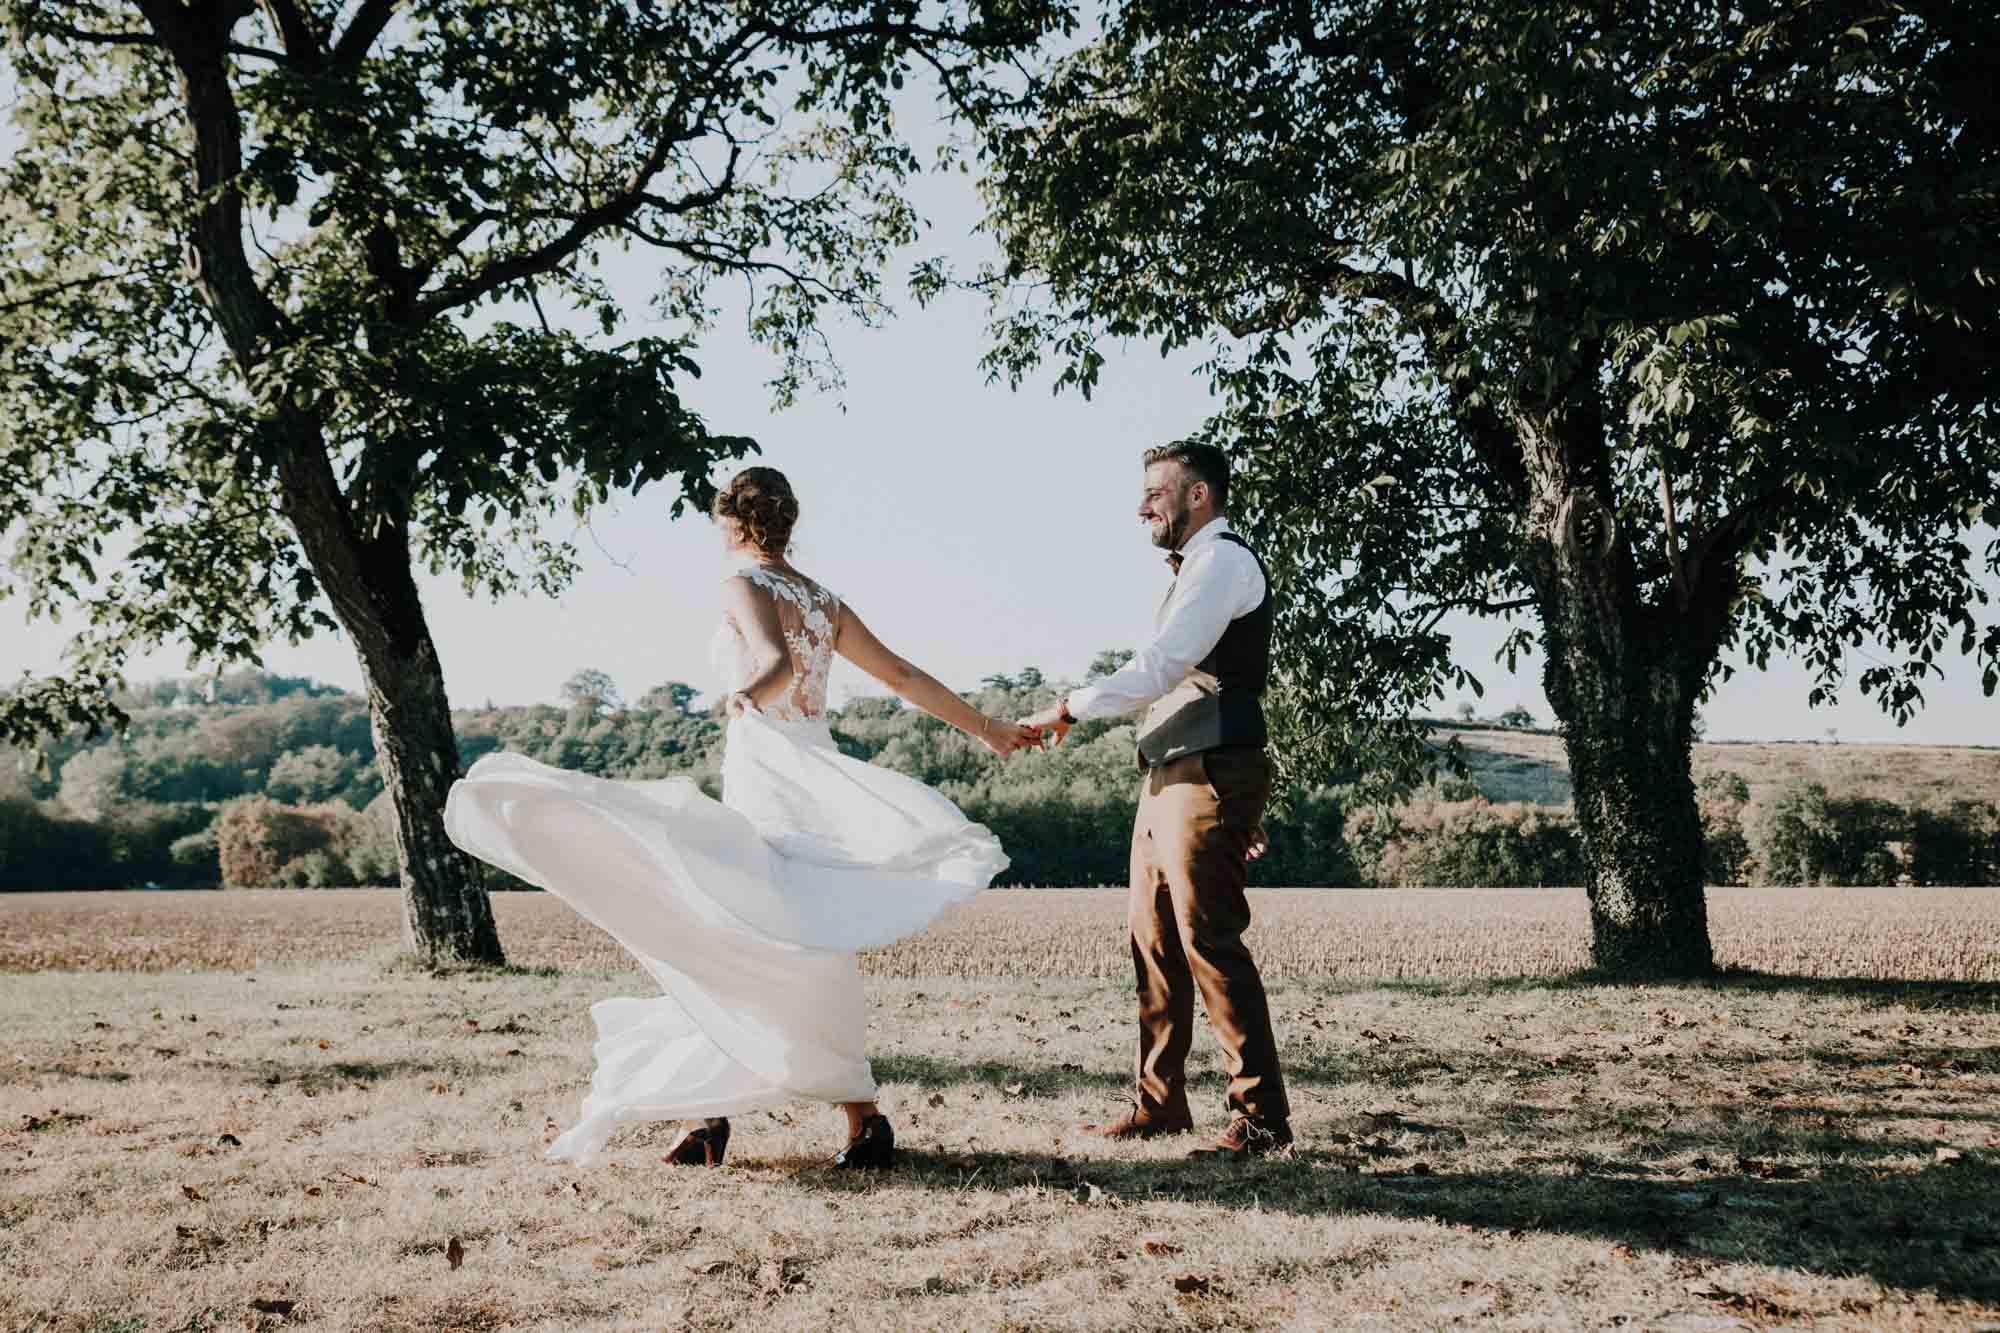 2018-09-29 - LD8_1497 - photographe mariage lyon - laurie diaz - www.lauriediazweeding.com.jpg